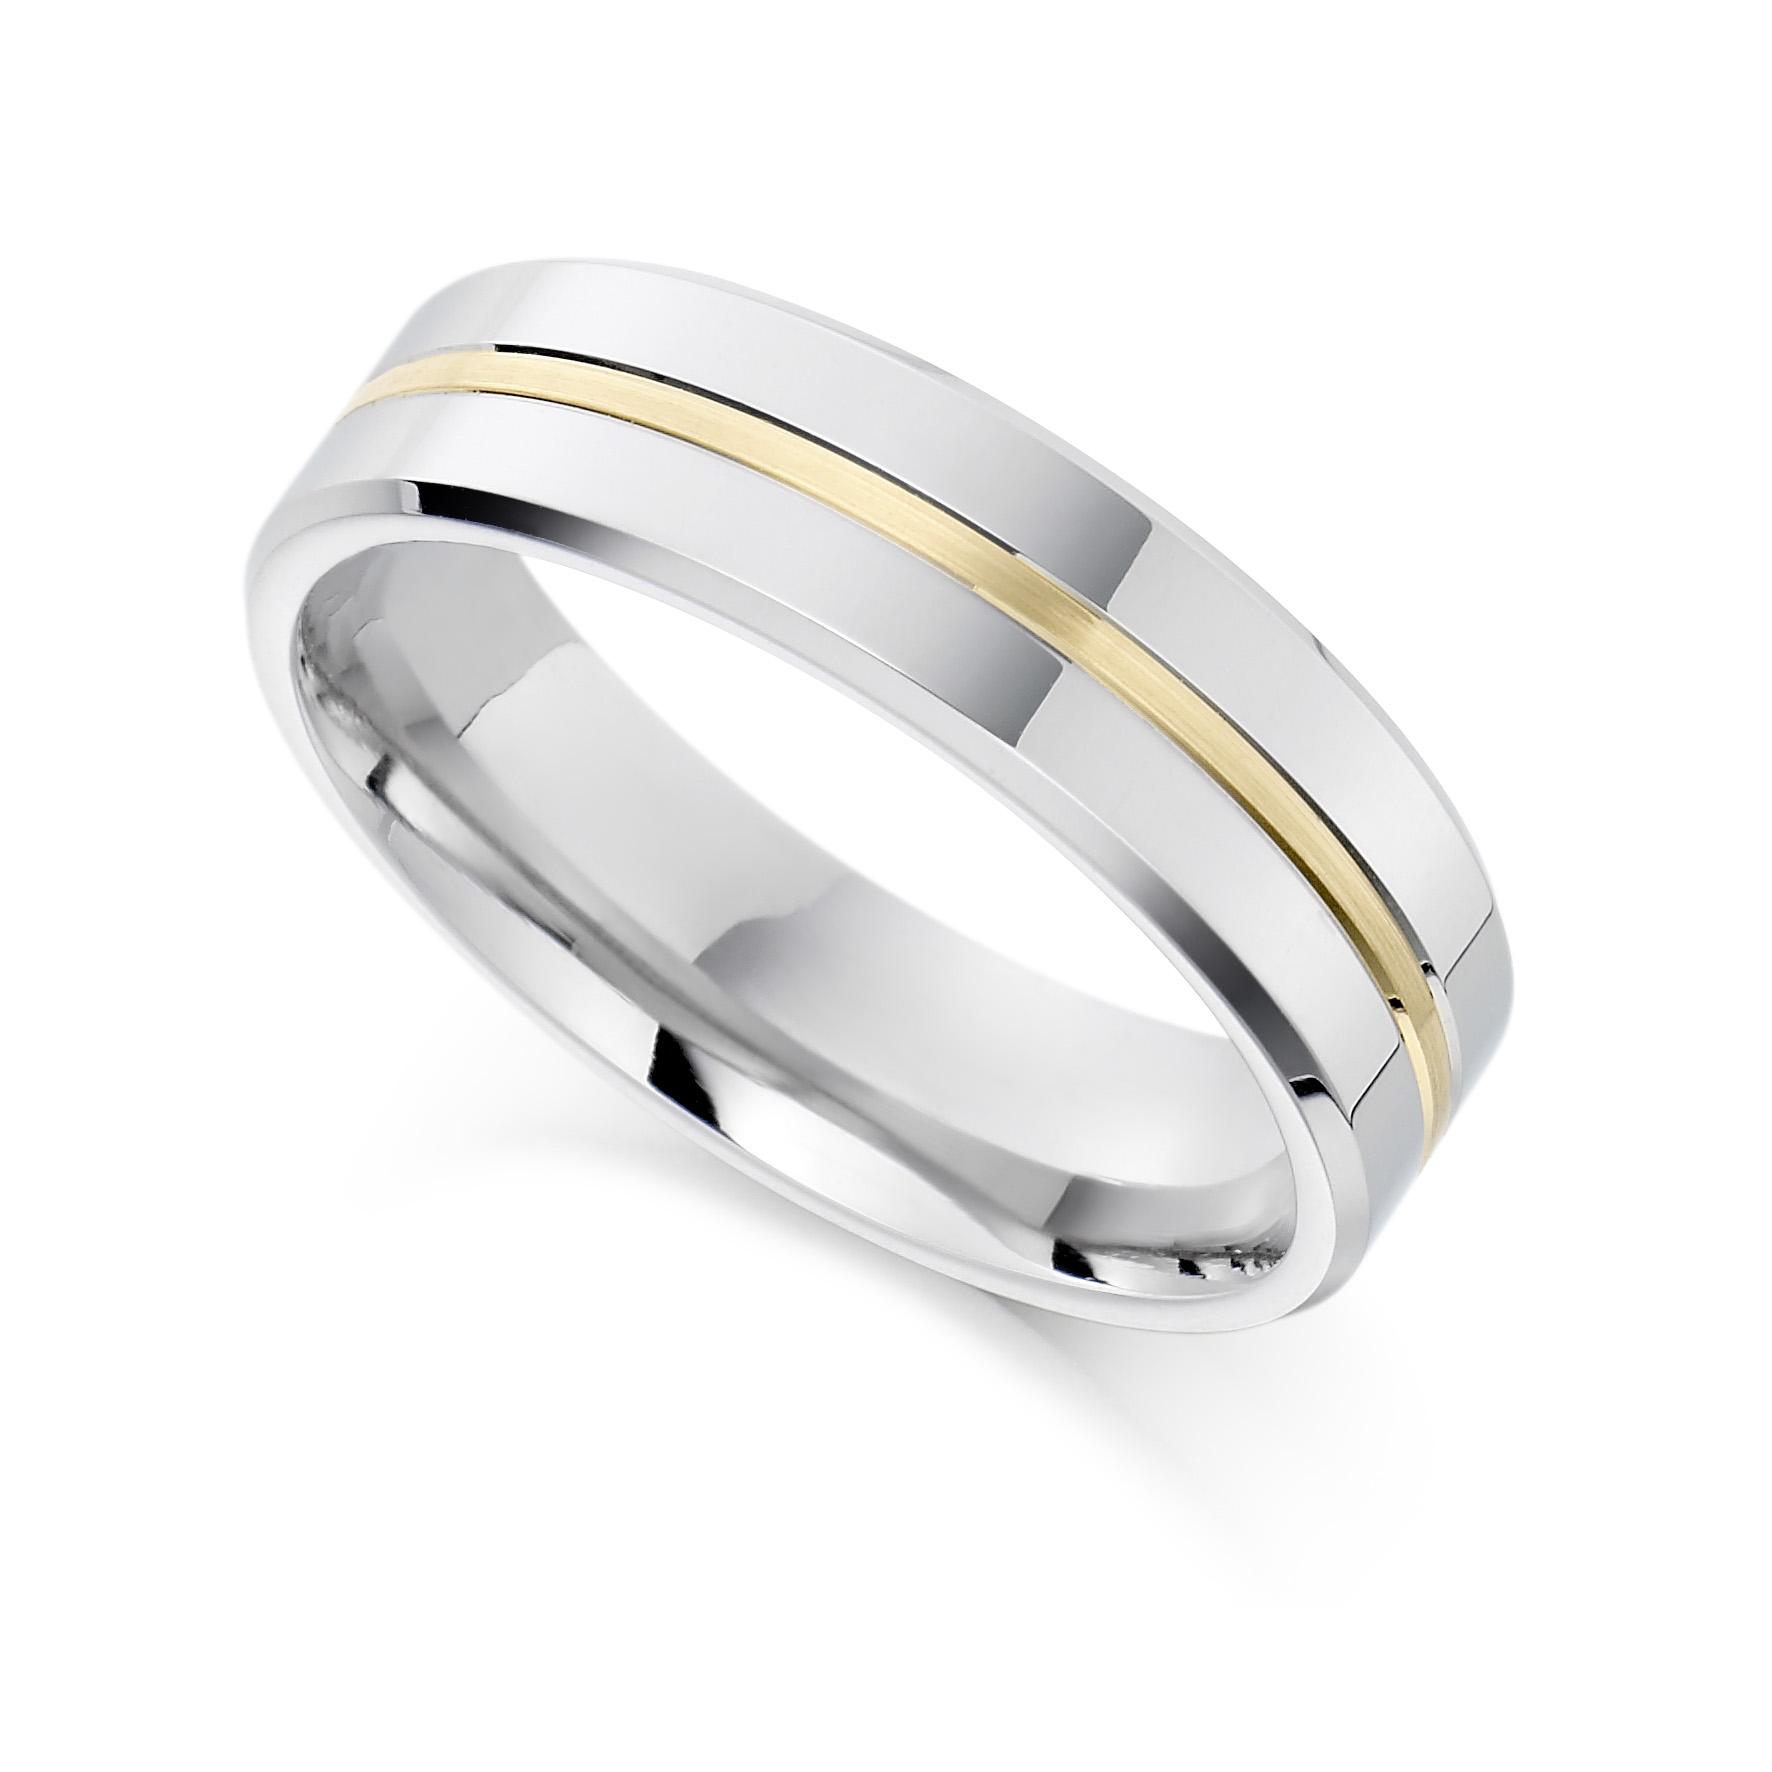 6mm Palladium and 18ct Yellow Gold Ring-0